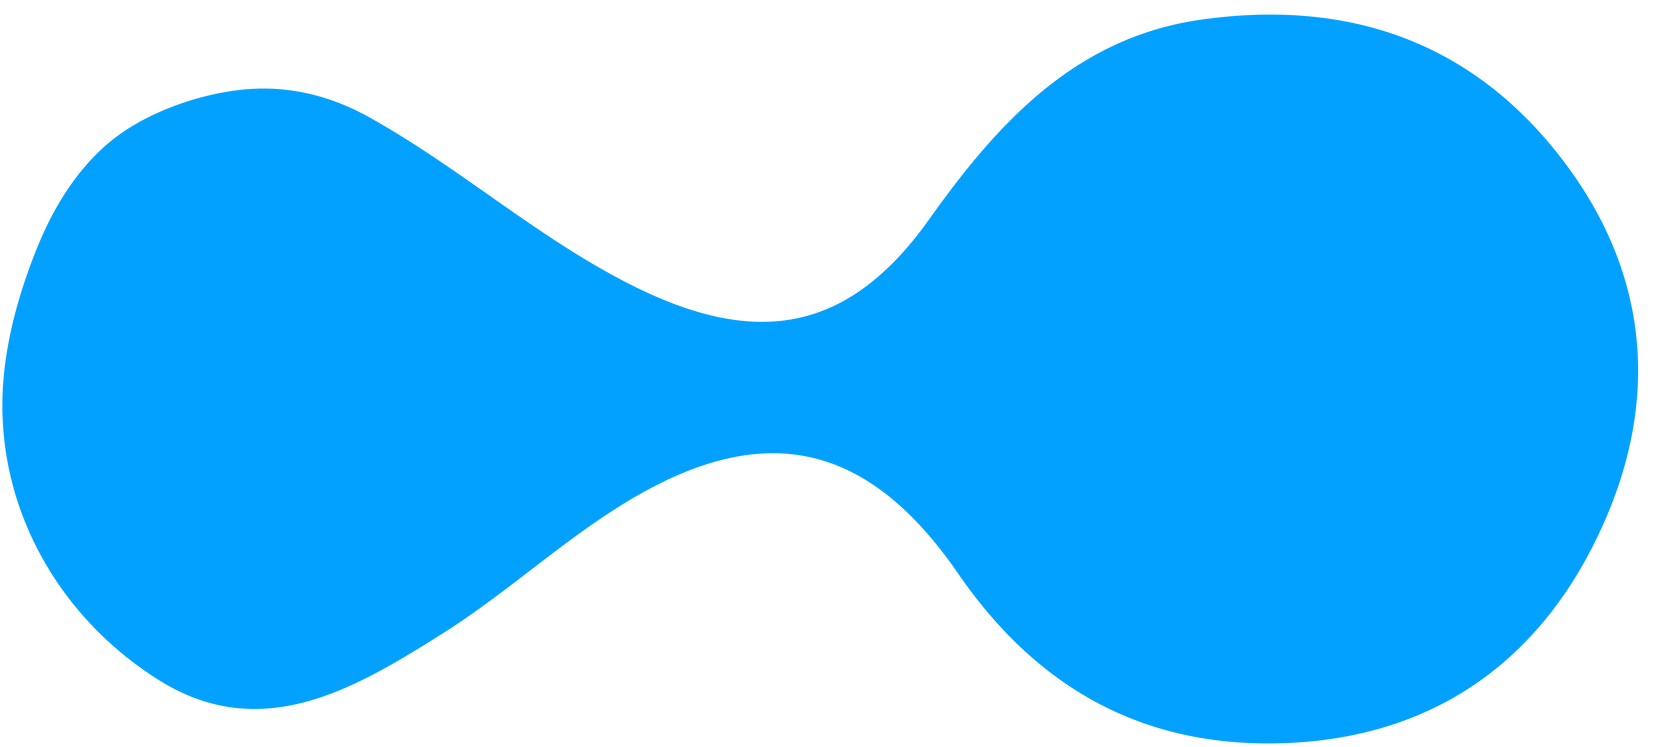 Forma azul.png